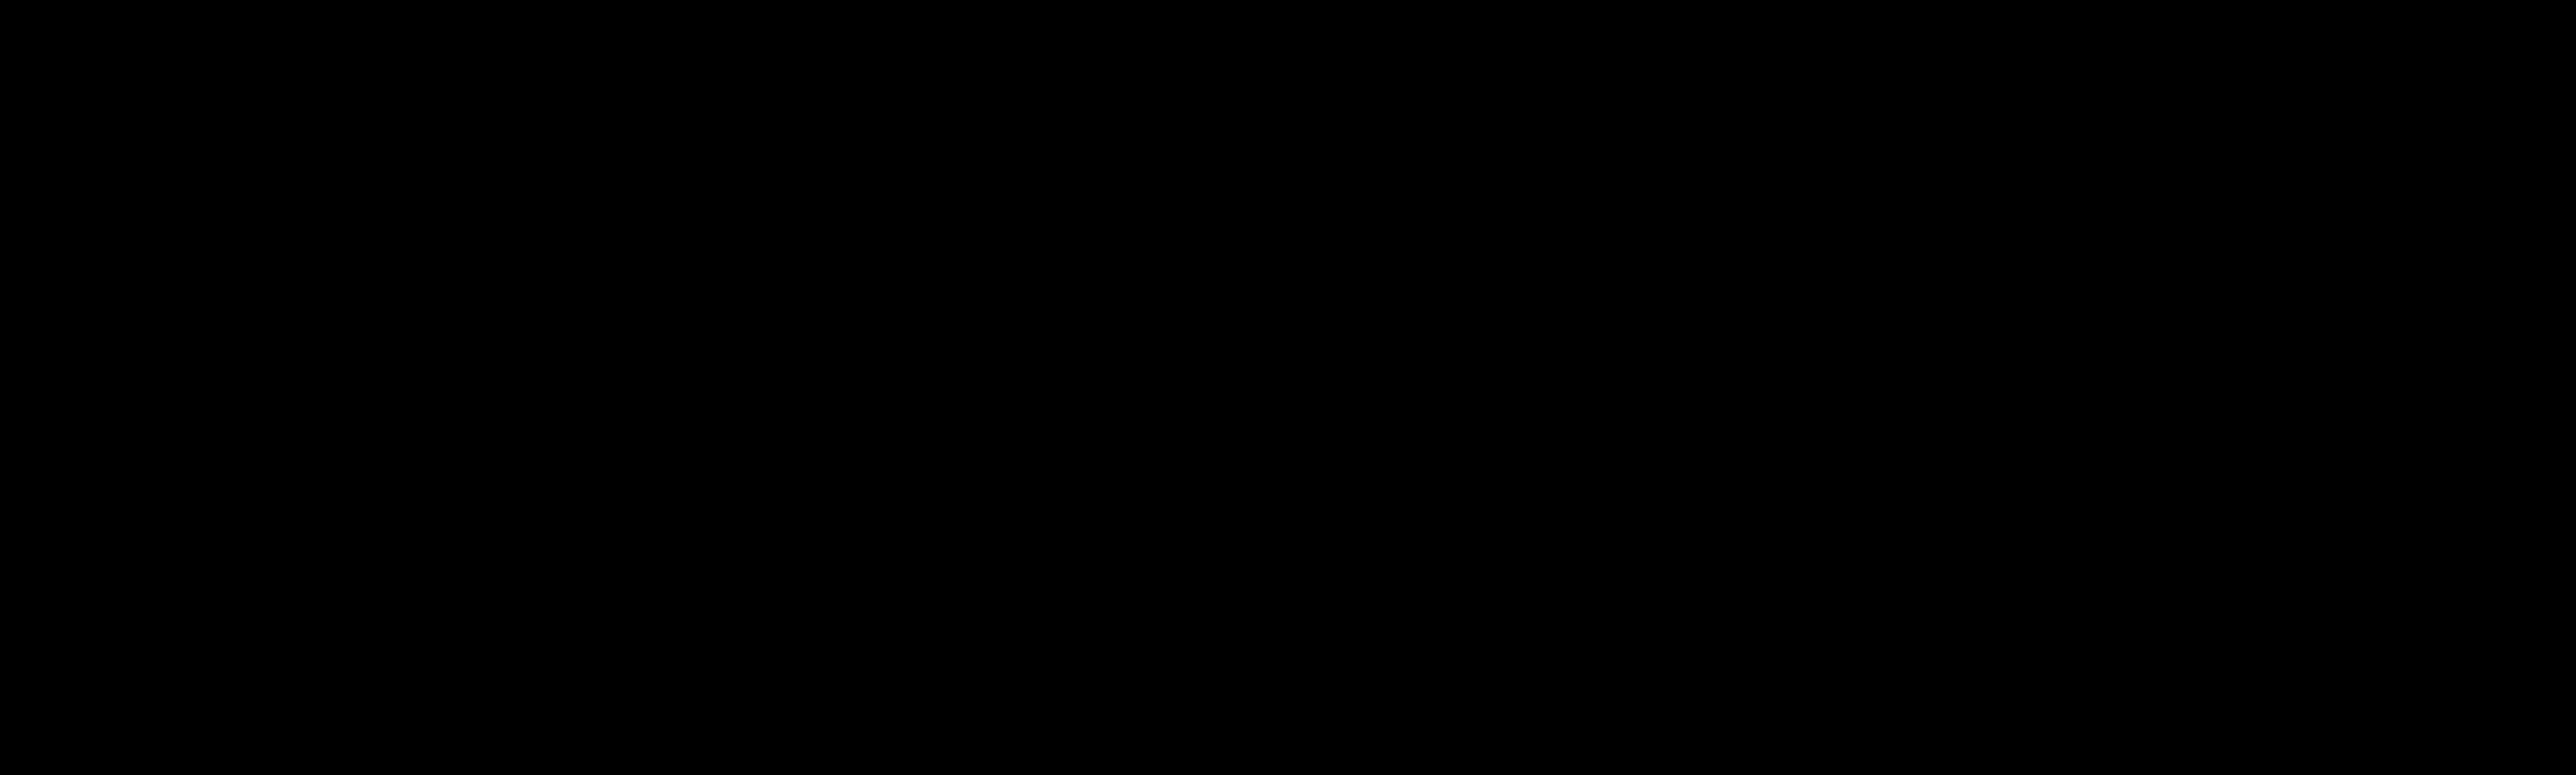 N-(5-Aminooxyacetamidopentyl)-biotinamide